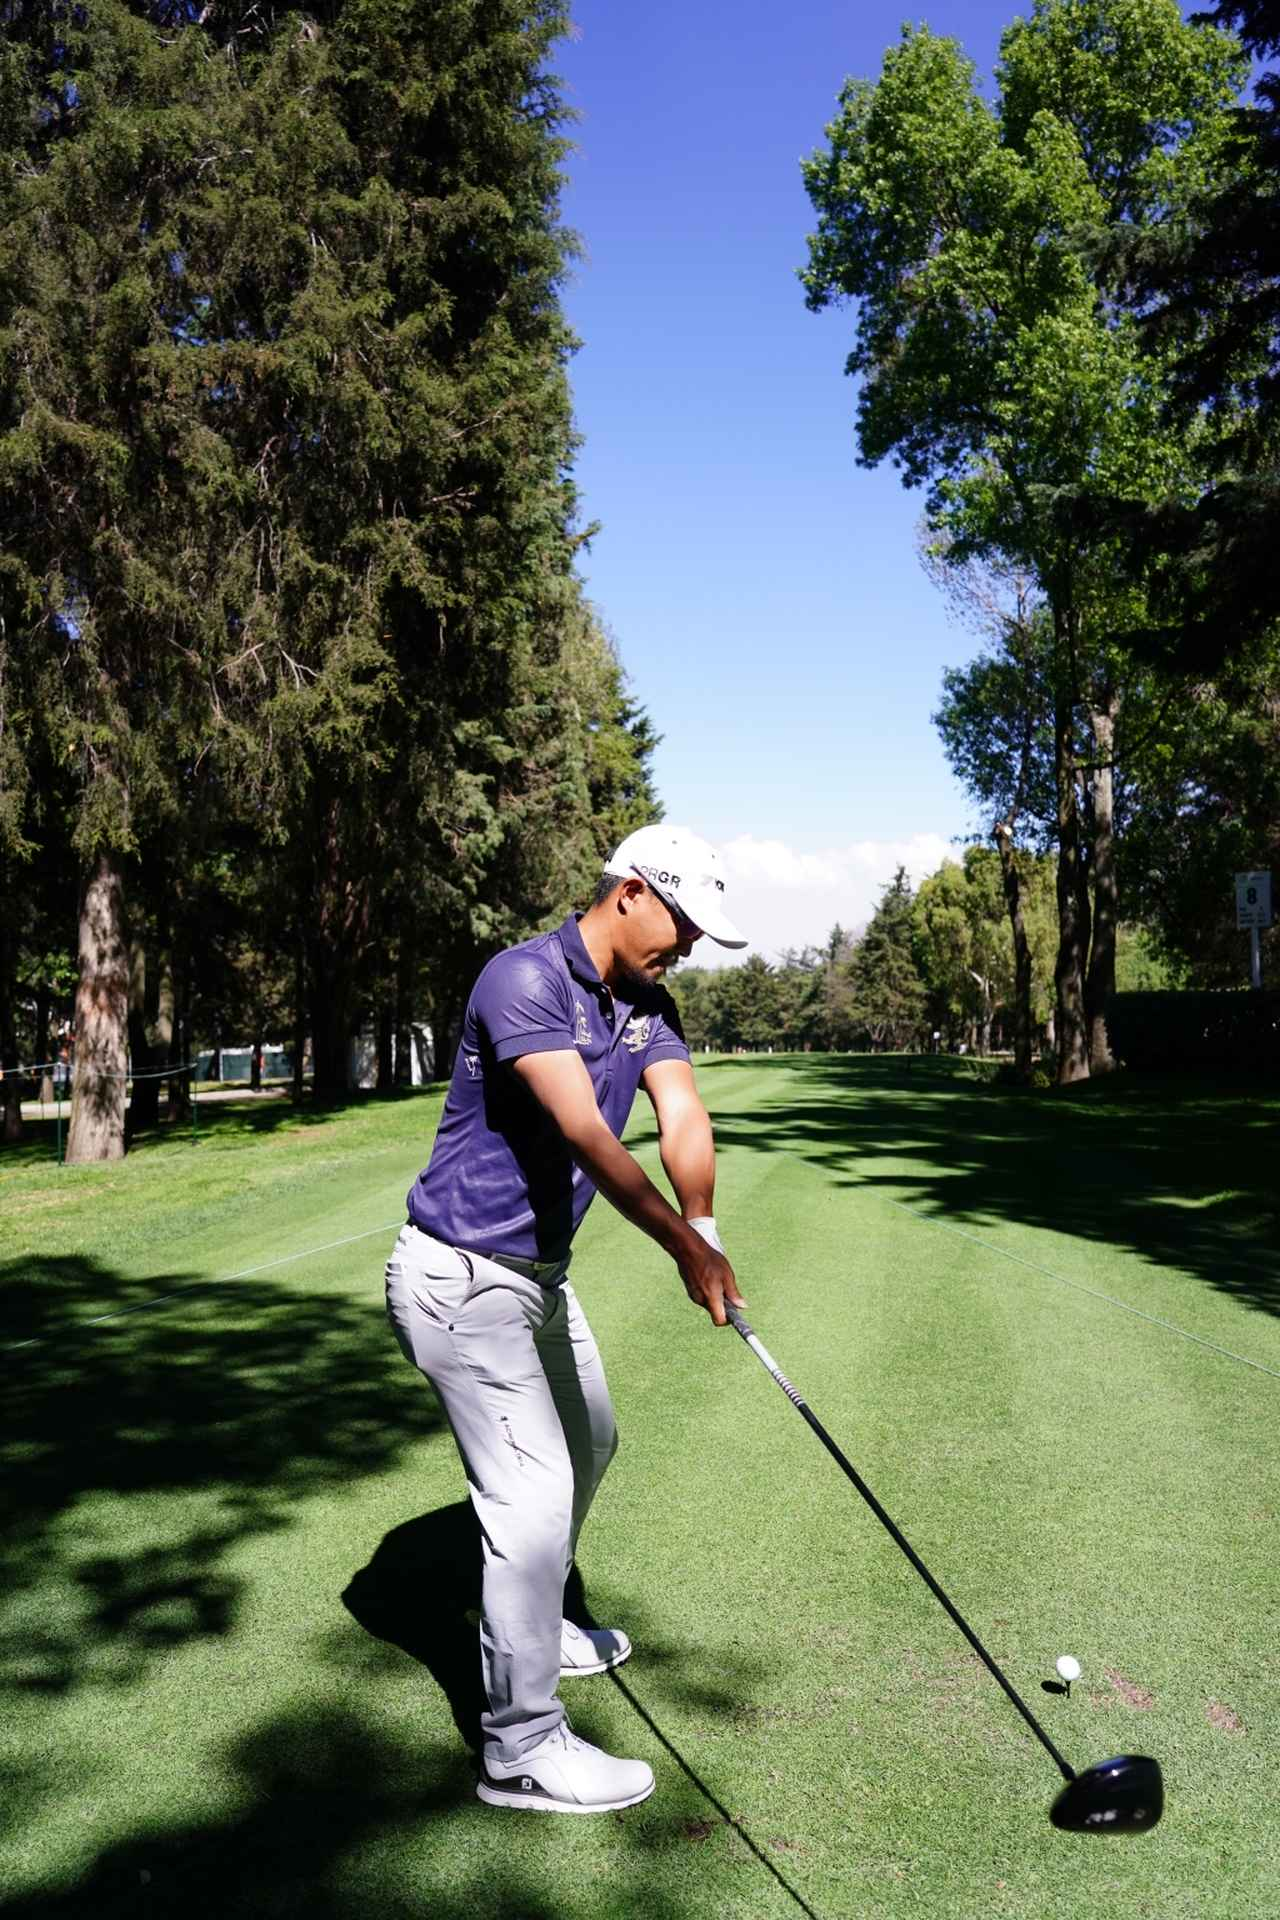 Images : 2番目の画像 - 小平智のドライバー連続写真 - みんなのゴルフダイジェスト